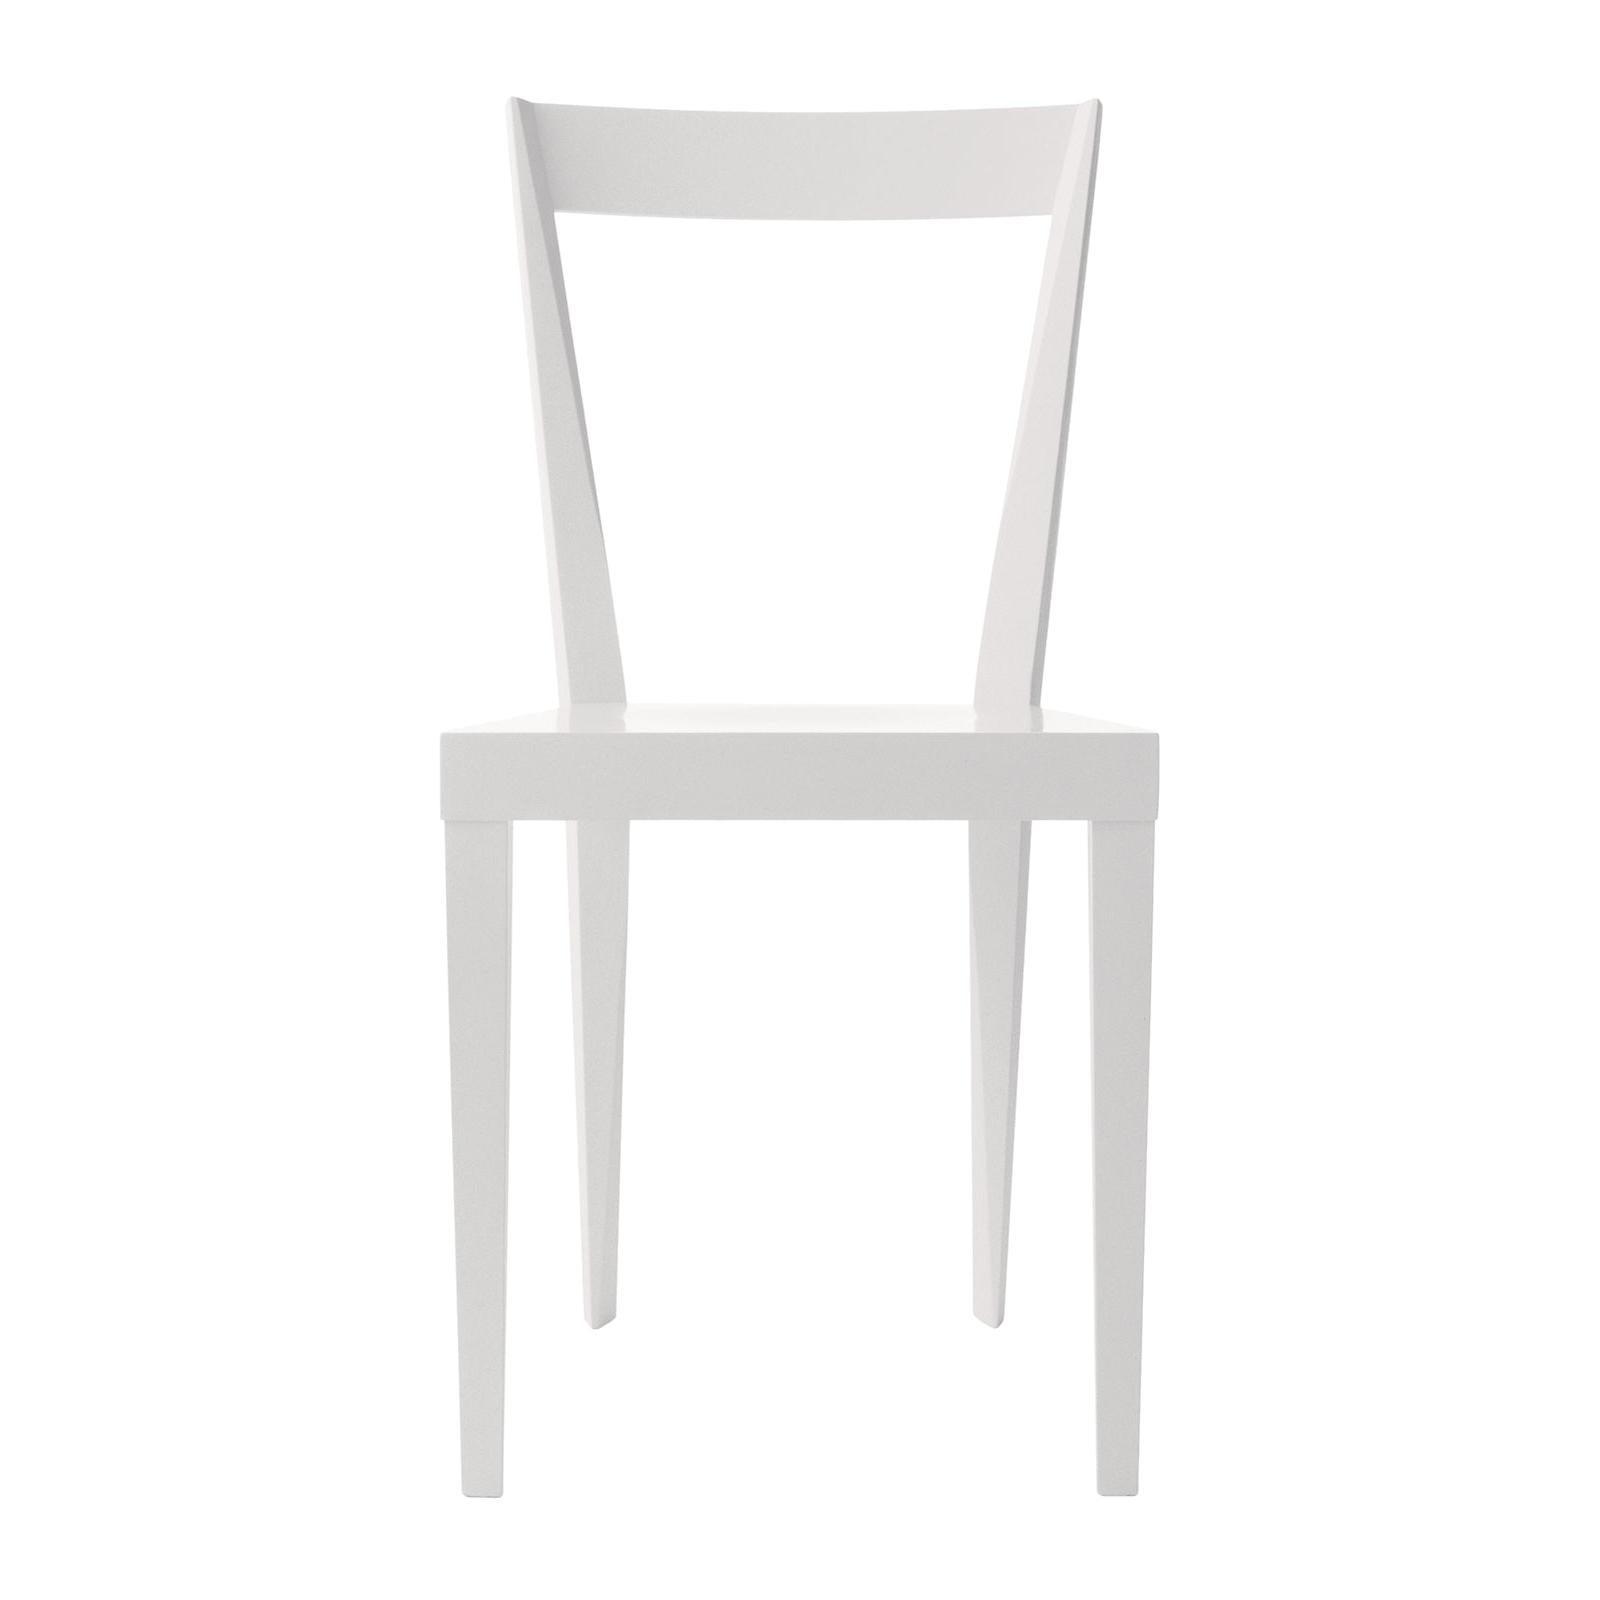 Set of 2 Livia White Chairs by Gio Ponti